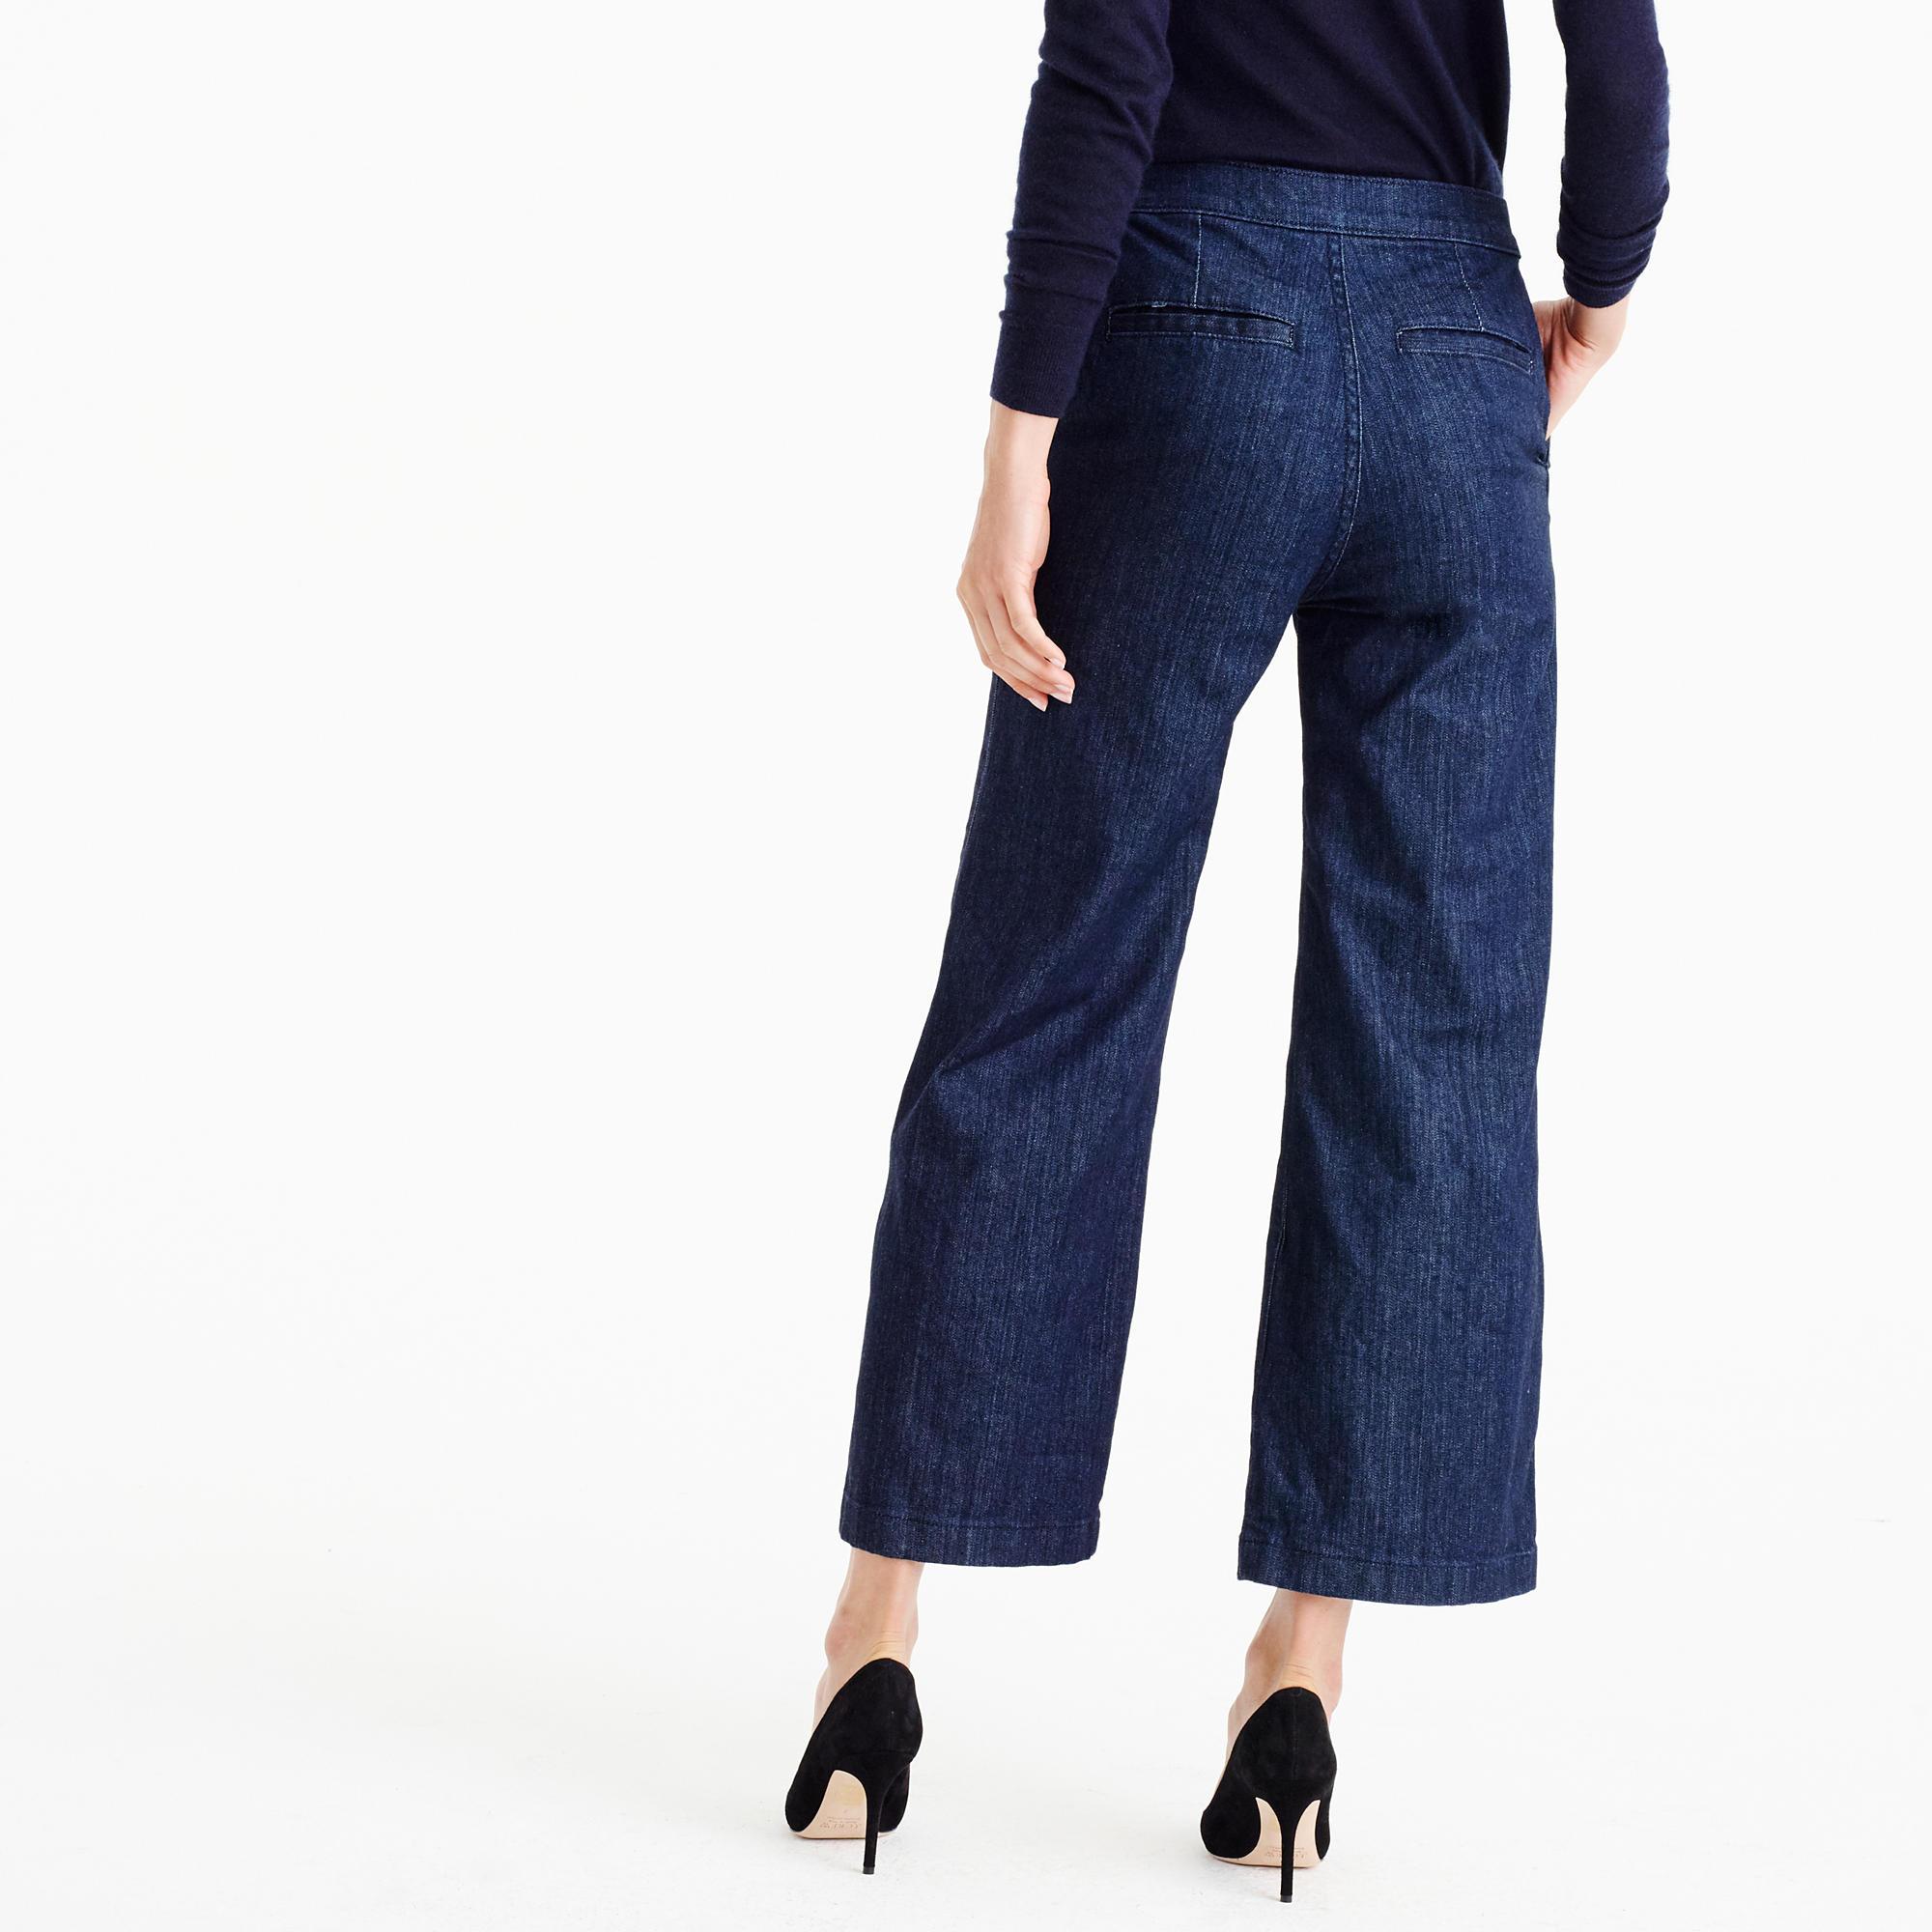 Rayner Trouser Jean In Dark Wash : Women's Jeans   J.Crew